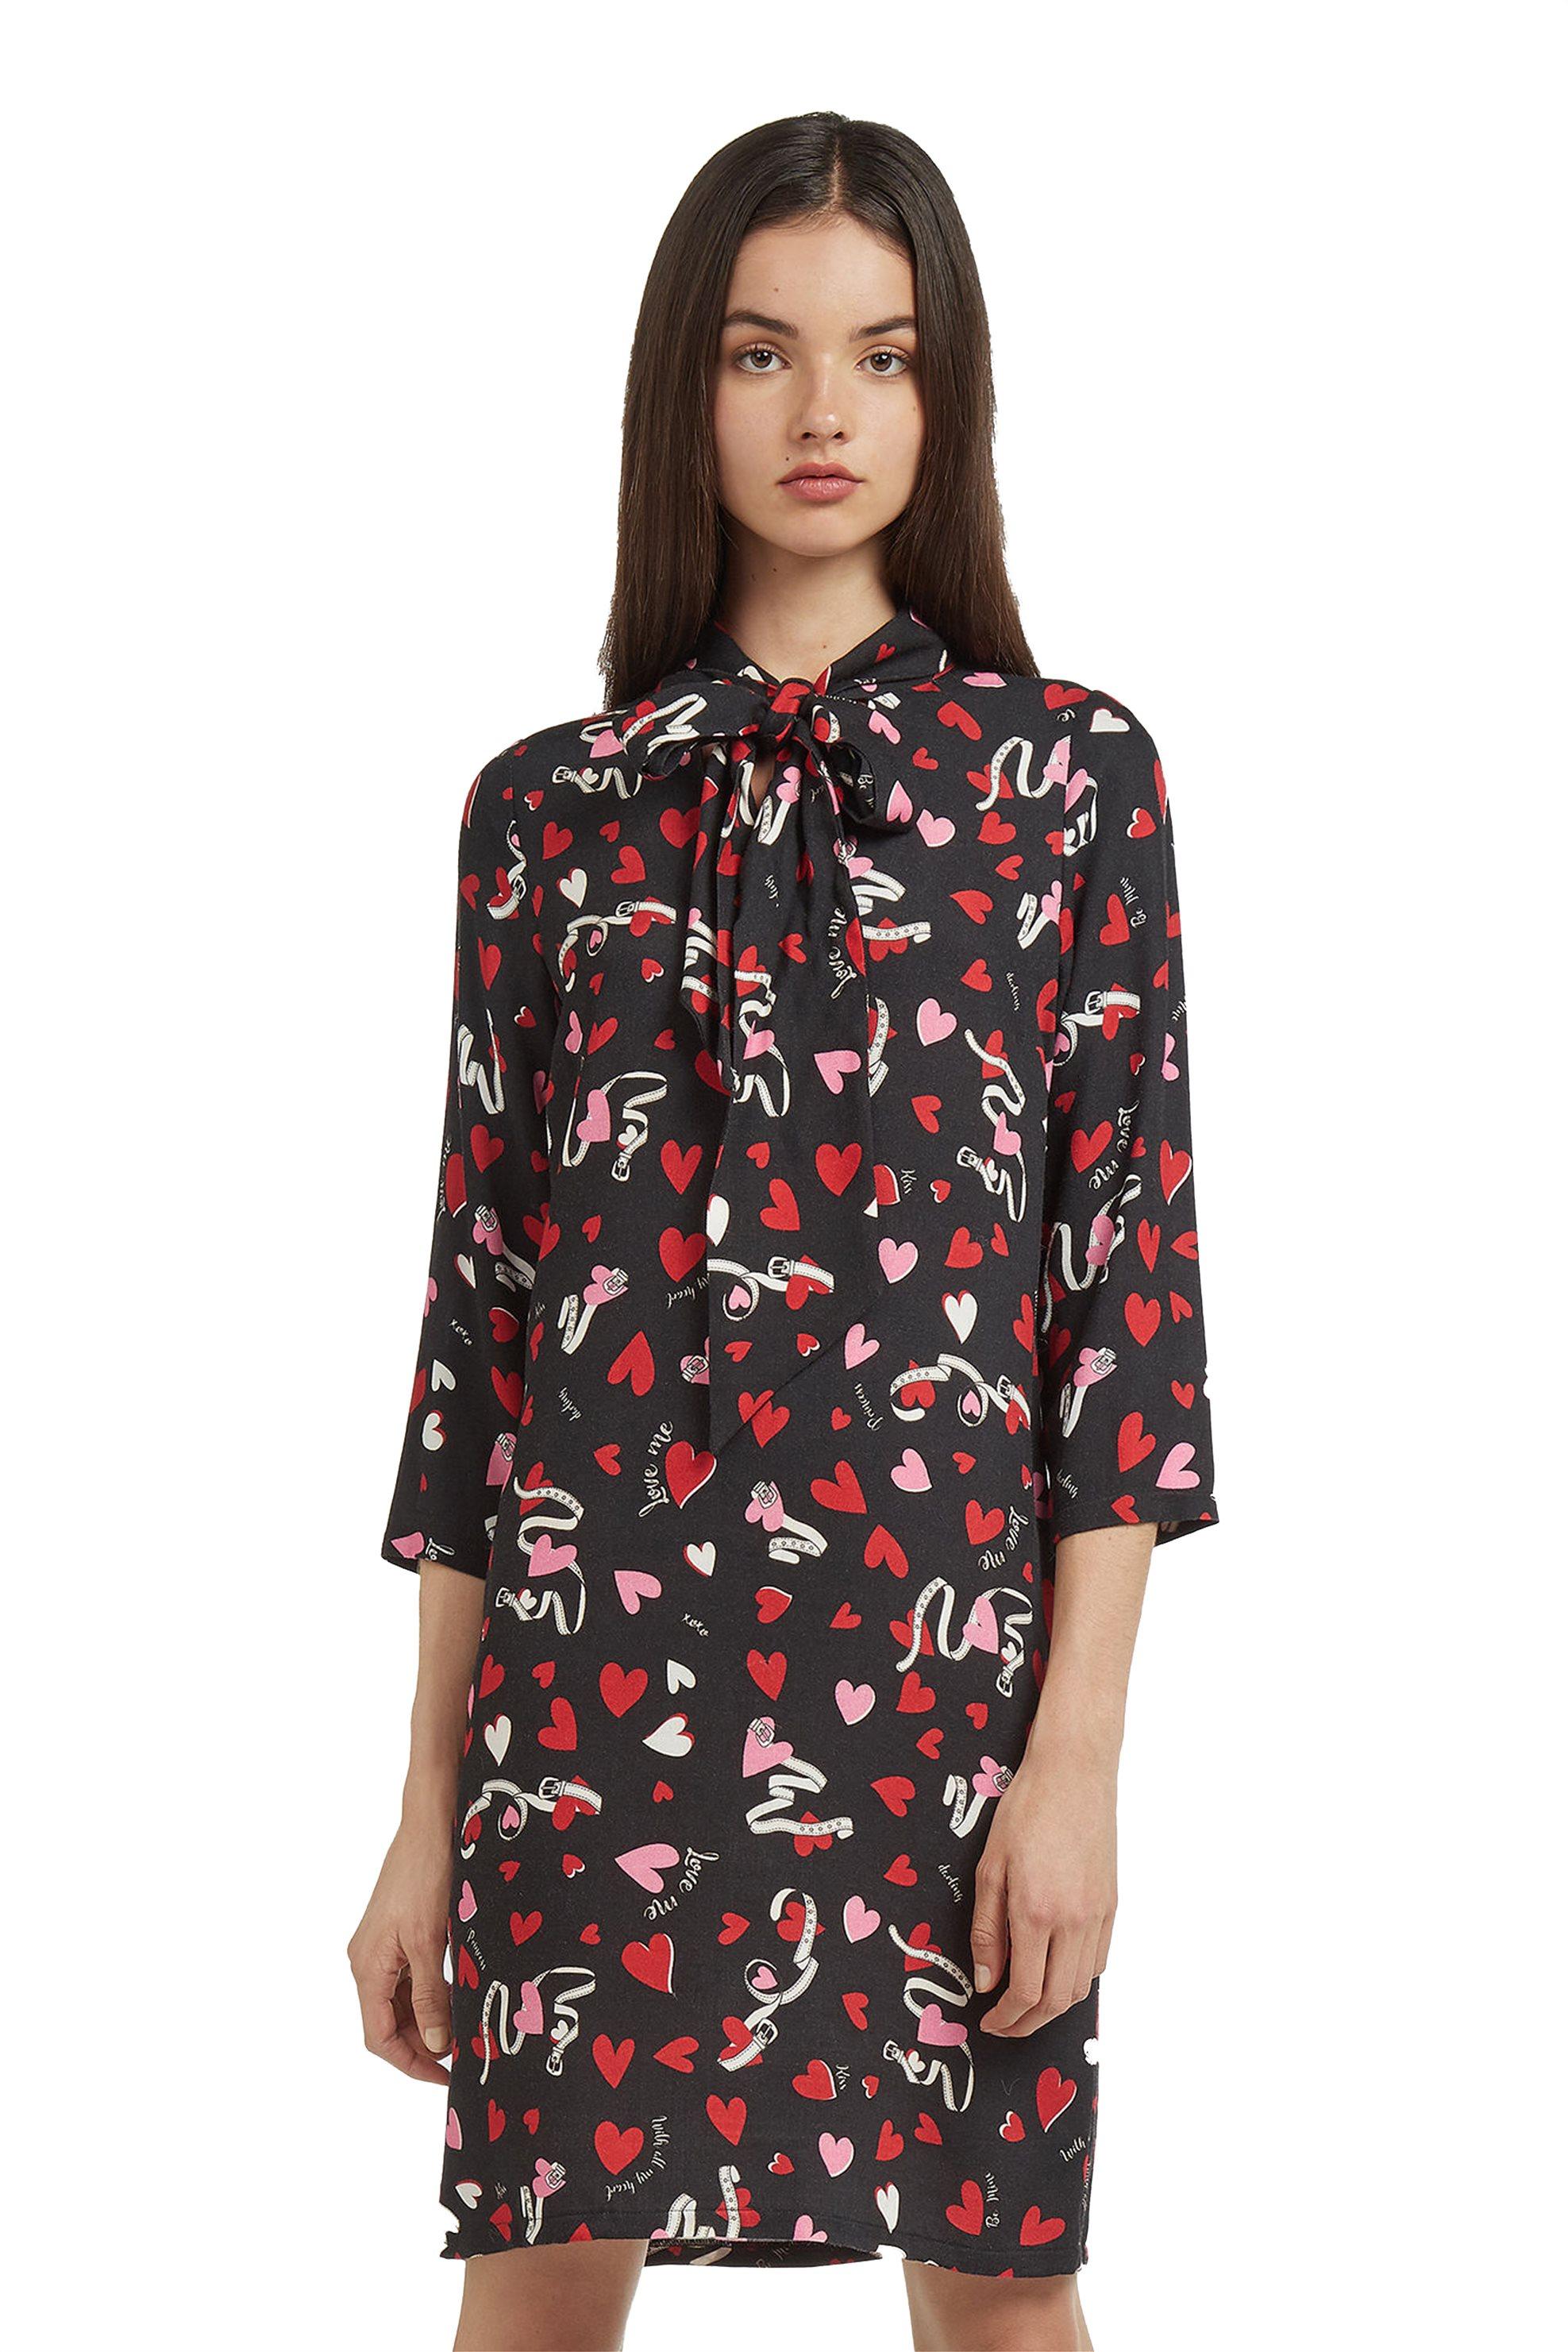 Trussardi Jeans γυναικείο φόρεμα heart print - 56D00159-1T001506 - Μαύρο γυναικα   ρουχα   φορέματα   mini φορέματα